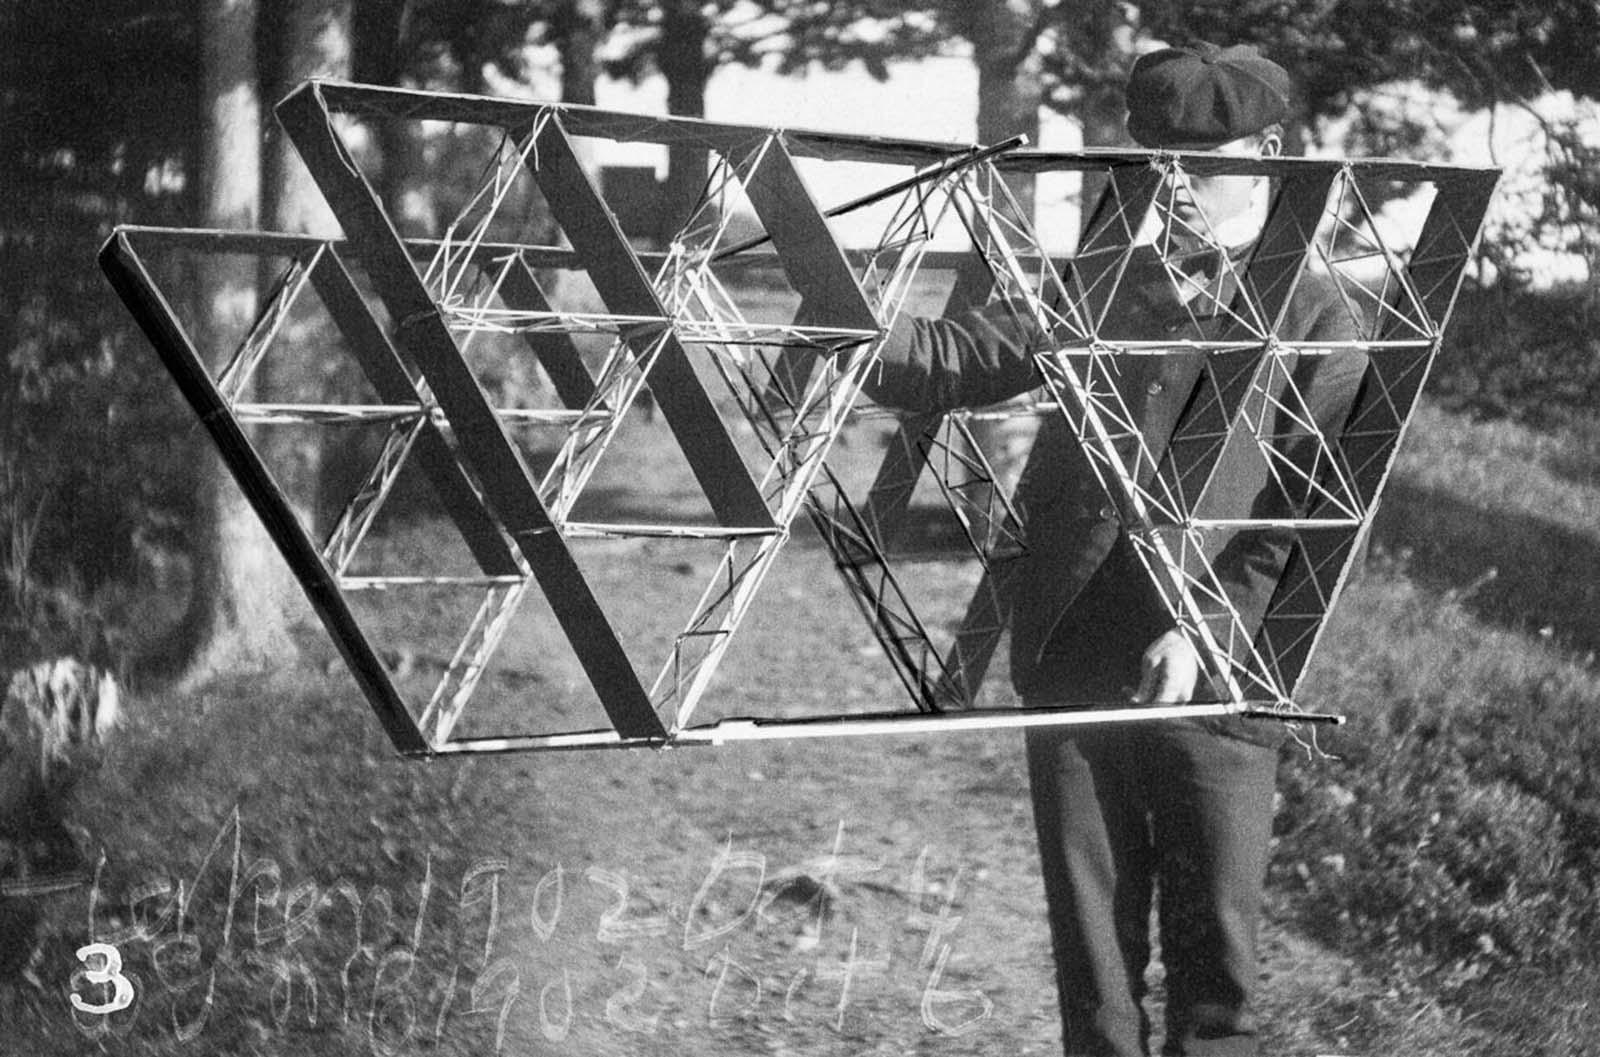 alexander graham bell tetrahedral kites